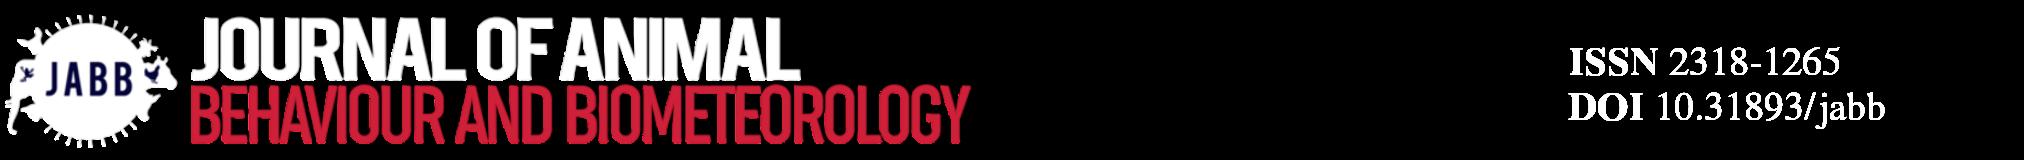 Journal of Animal Behaviour and Biometeorology